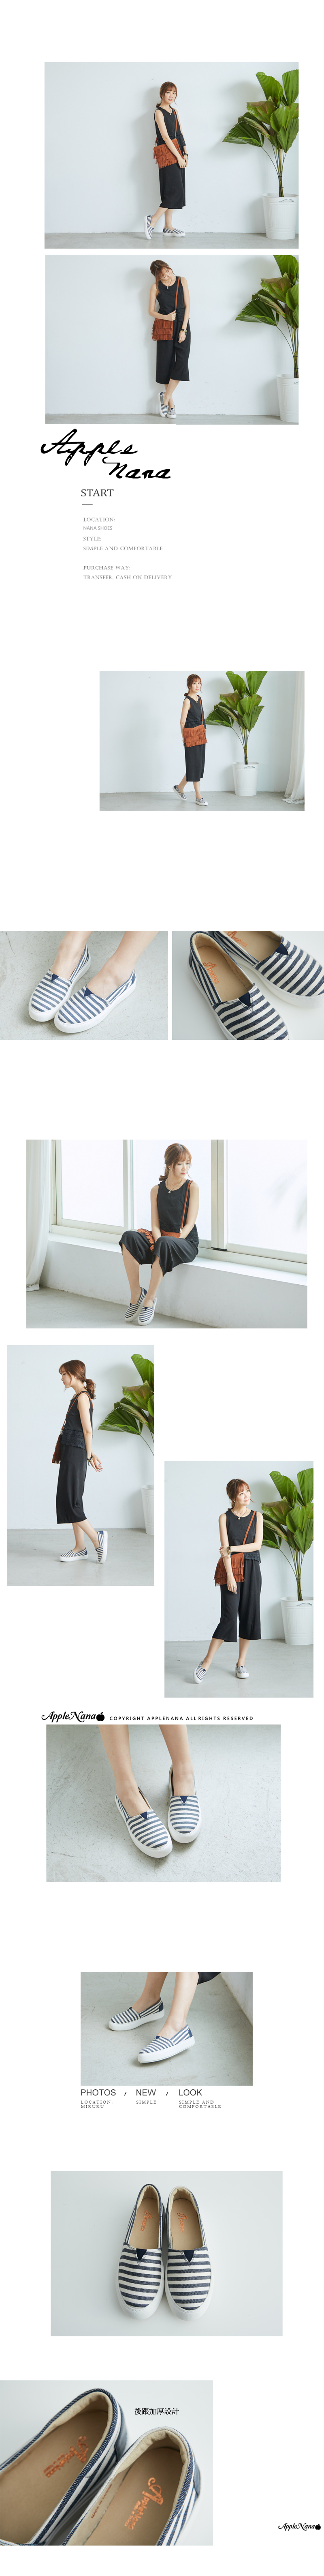 http://shop.r10s.com/5e7ca0c0-ec8c-11e4-ac44-005056b756e3/2016-04/11342-1.jpg